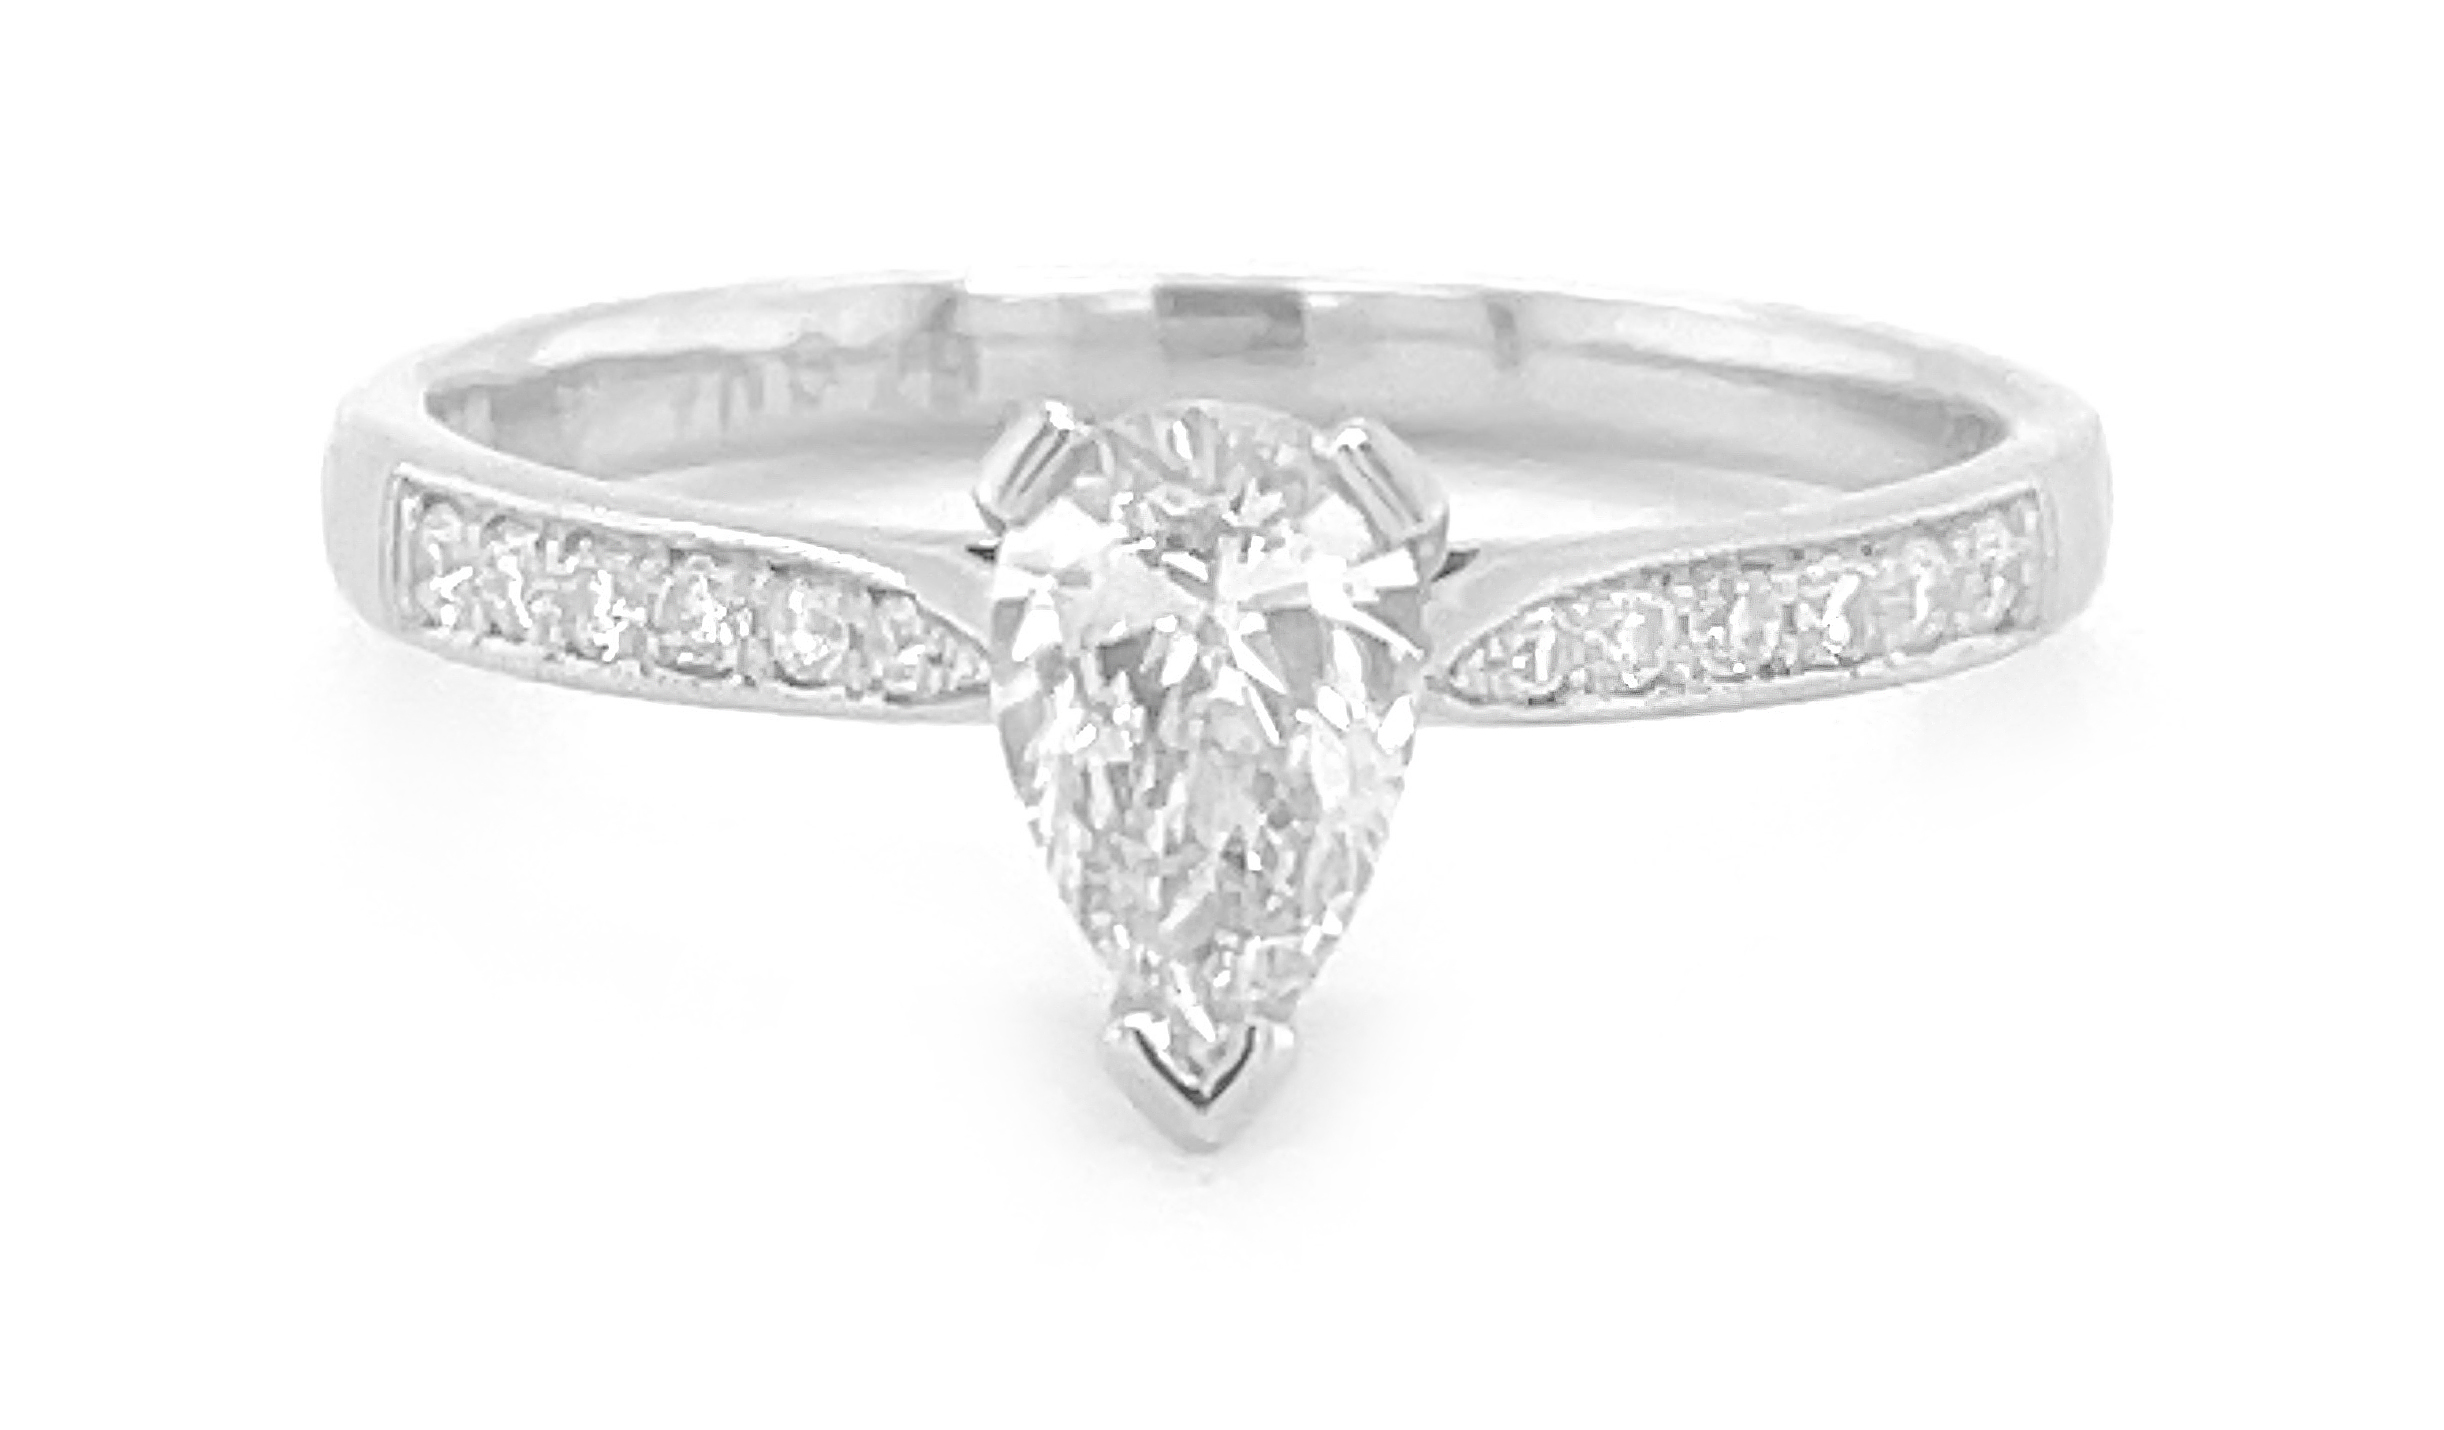 18k White Gold Pearshape Diamond Solitaire Ring, Diamond Shoulders